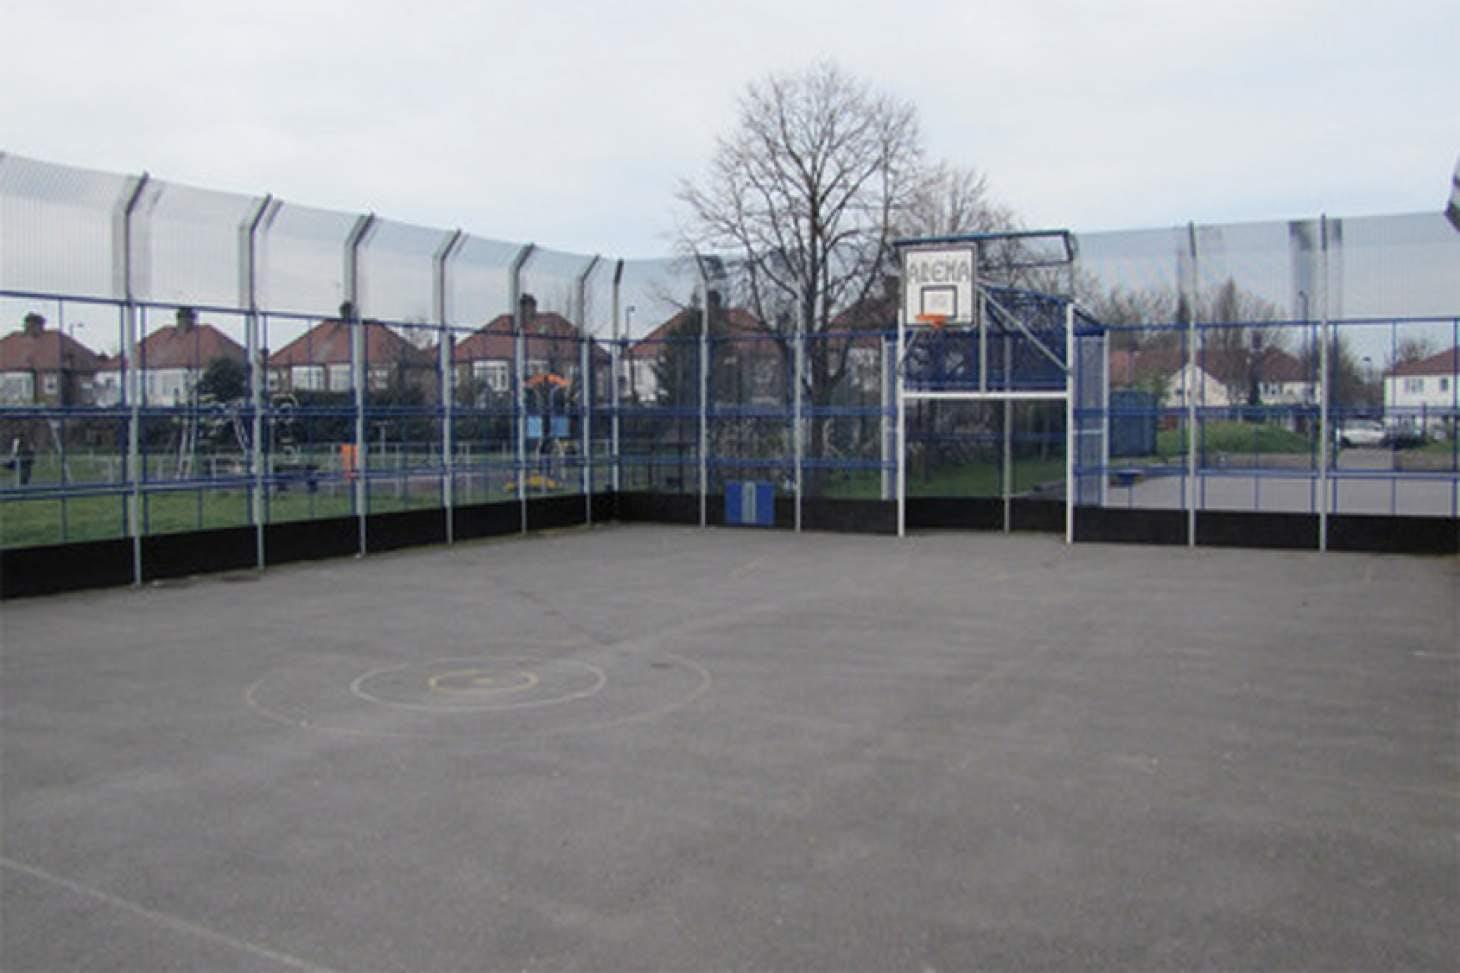 Wilbury Primary School